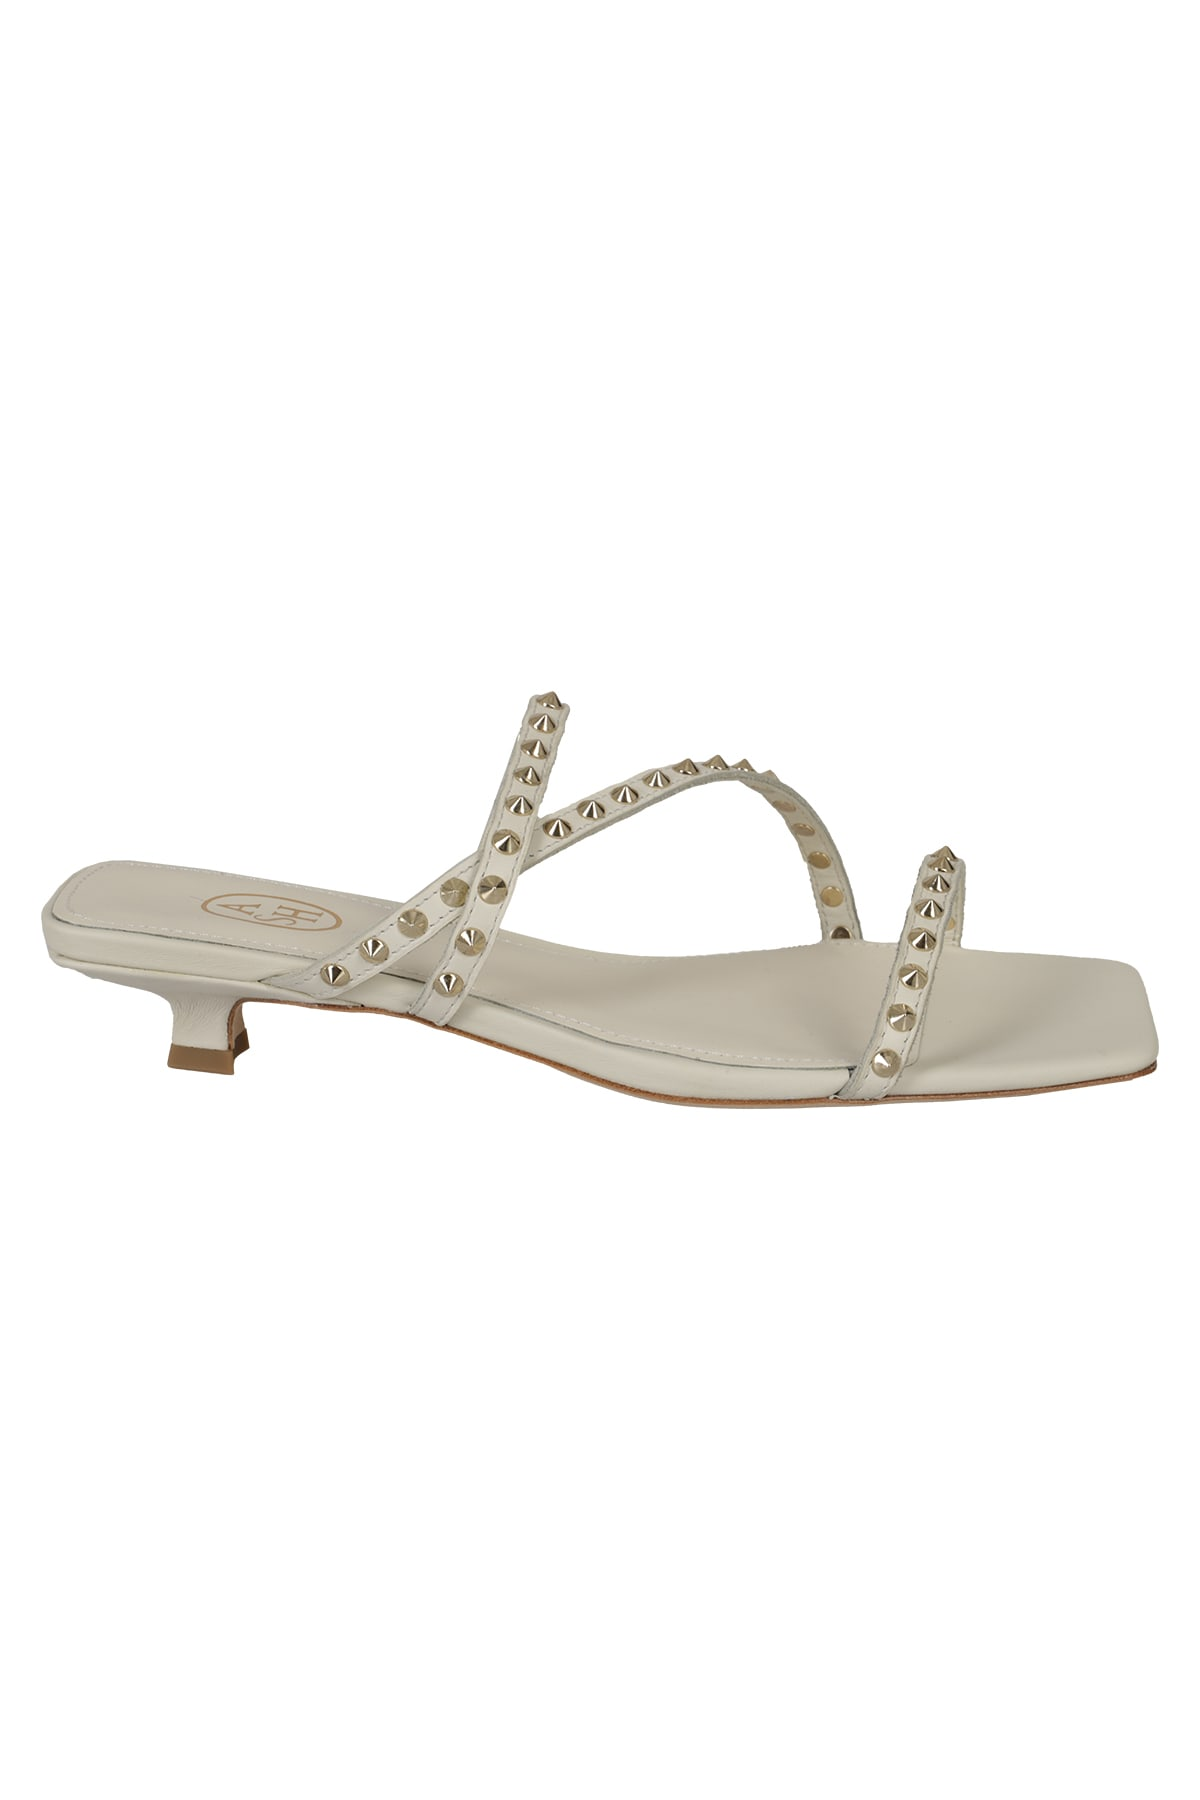 Ash Flat Shoes